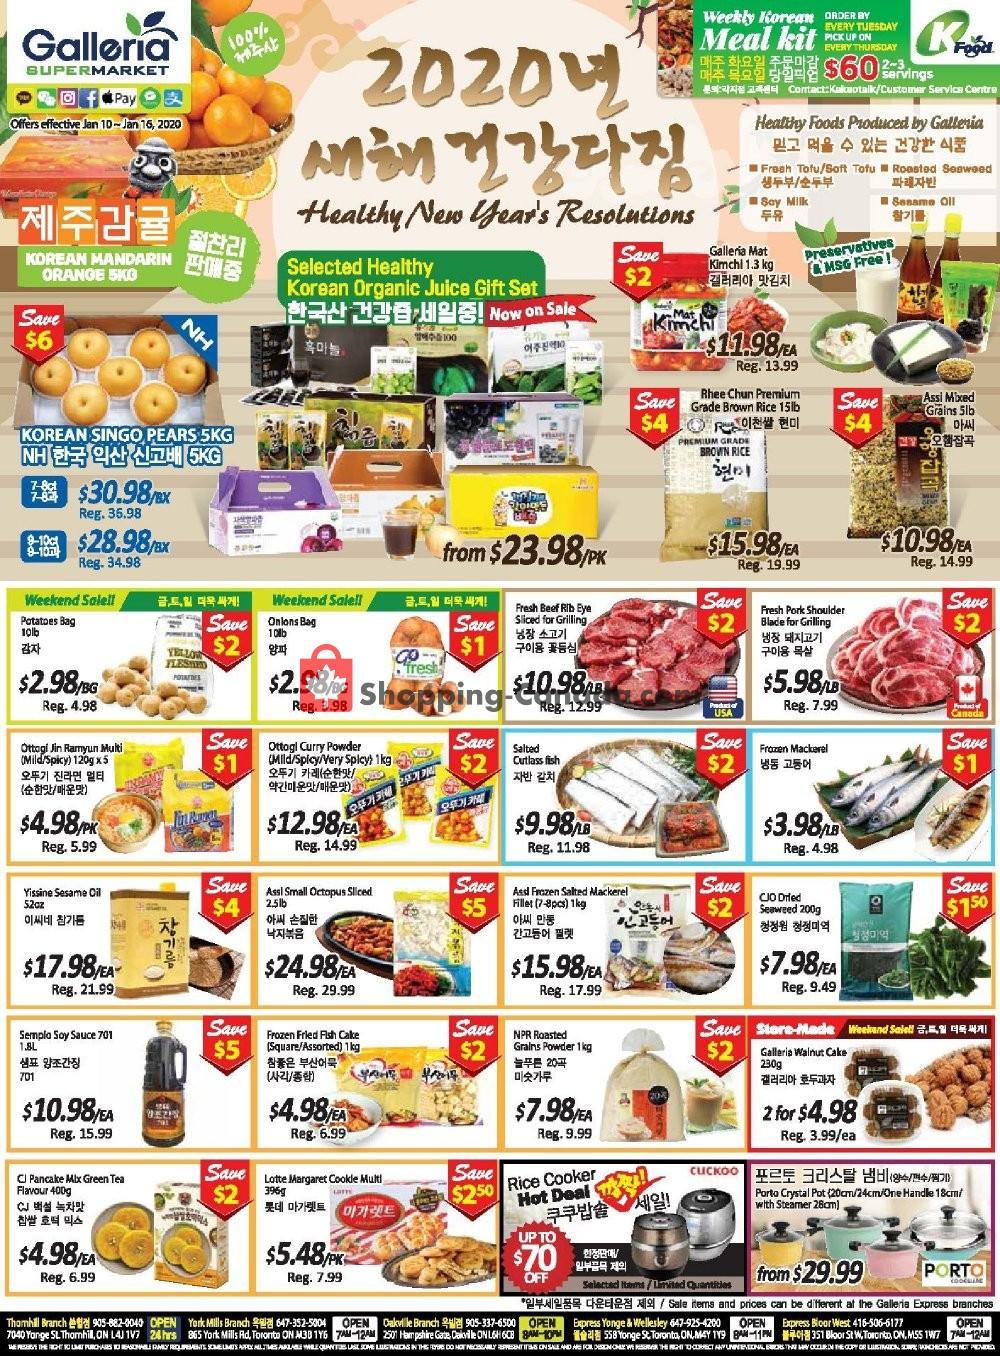 Flyer Galleria Supermarket Canada - from Friday January 10, 2020 to Thursday January 16, 2020